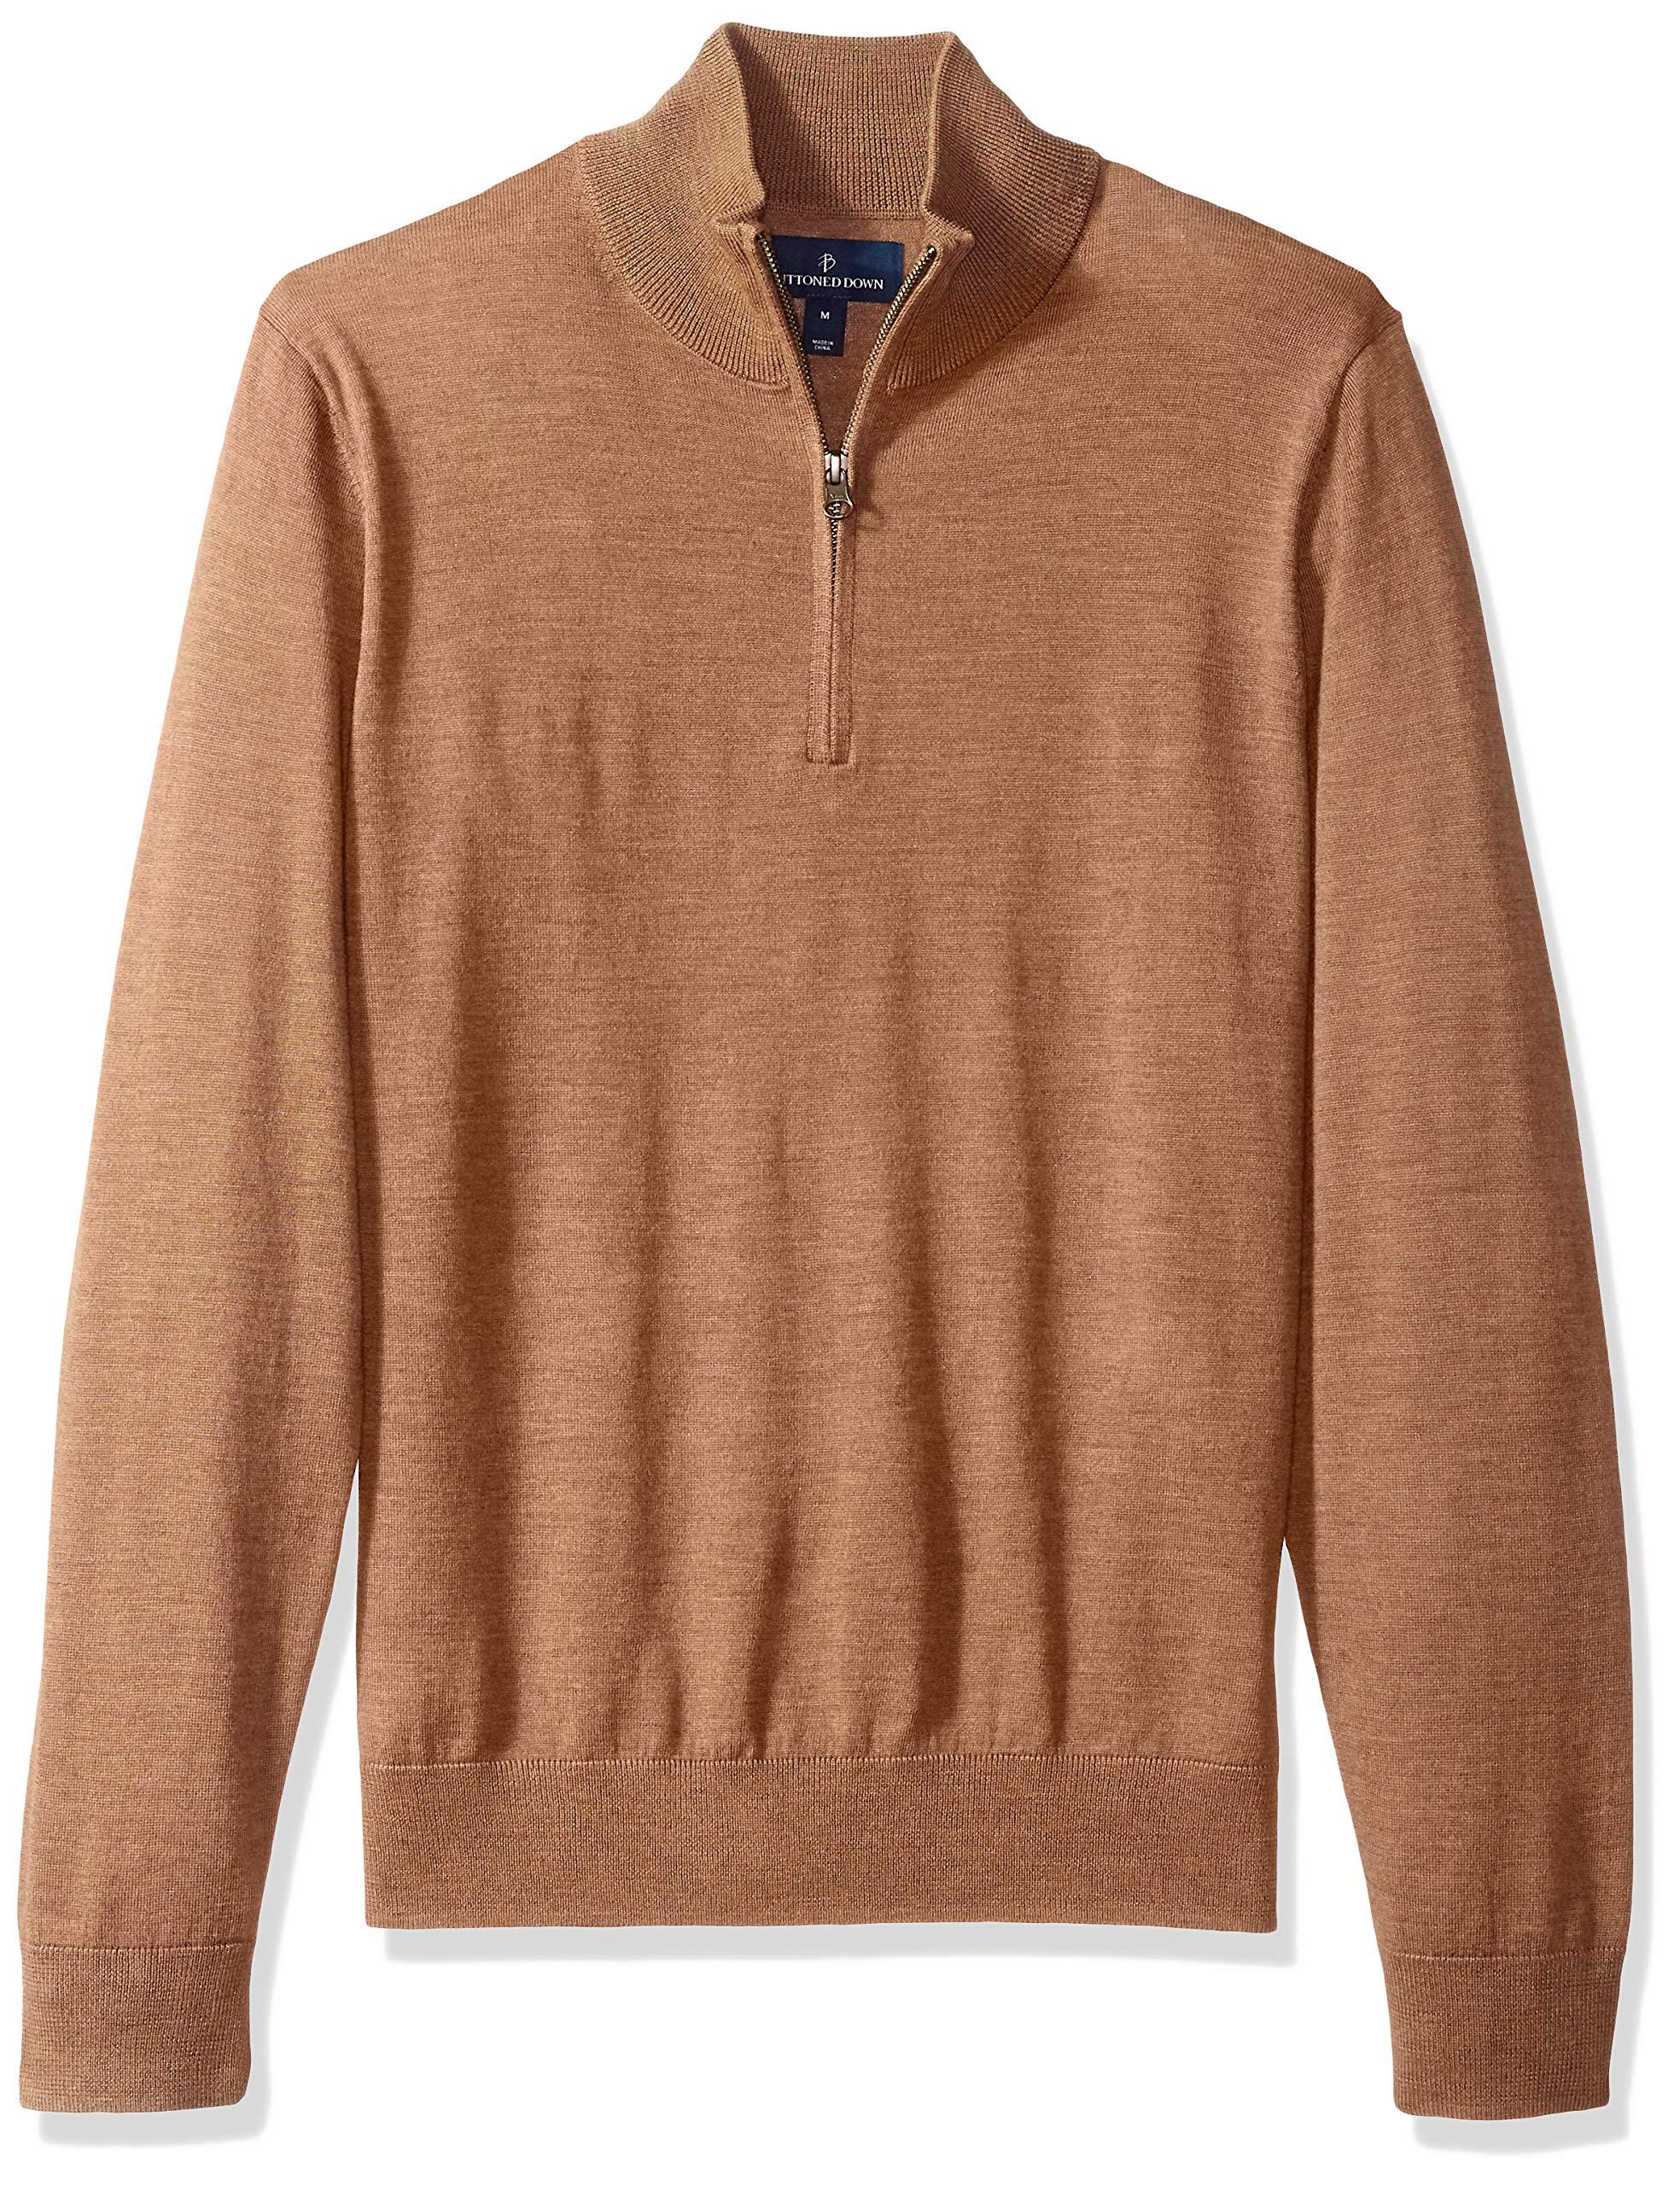 BUTTONED DOWN Men's Italian Merino Wool Lightweight Cashwool Quarter-Zip Sweater, Brown Heather, Medium